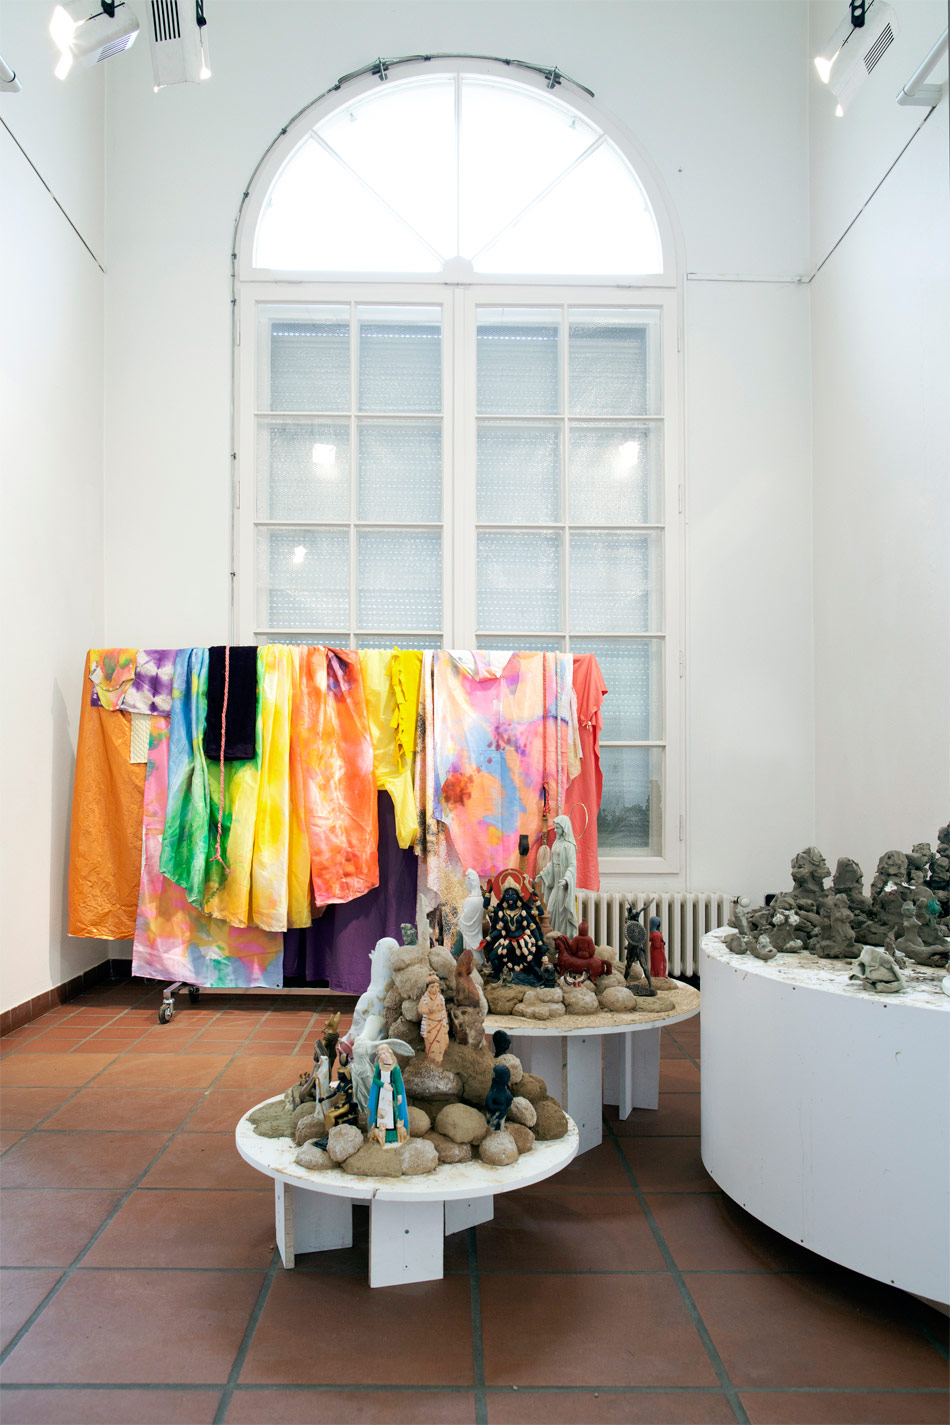 J&K, ter Heijne, Ray, Under Her Spell, installation view, Galerie im Körnerpark, photos: Christina Dimitriades